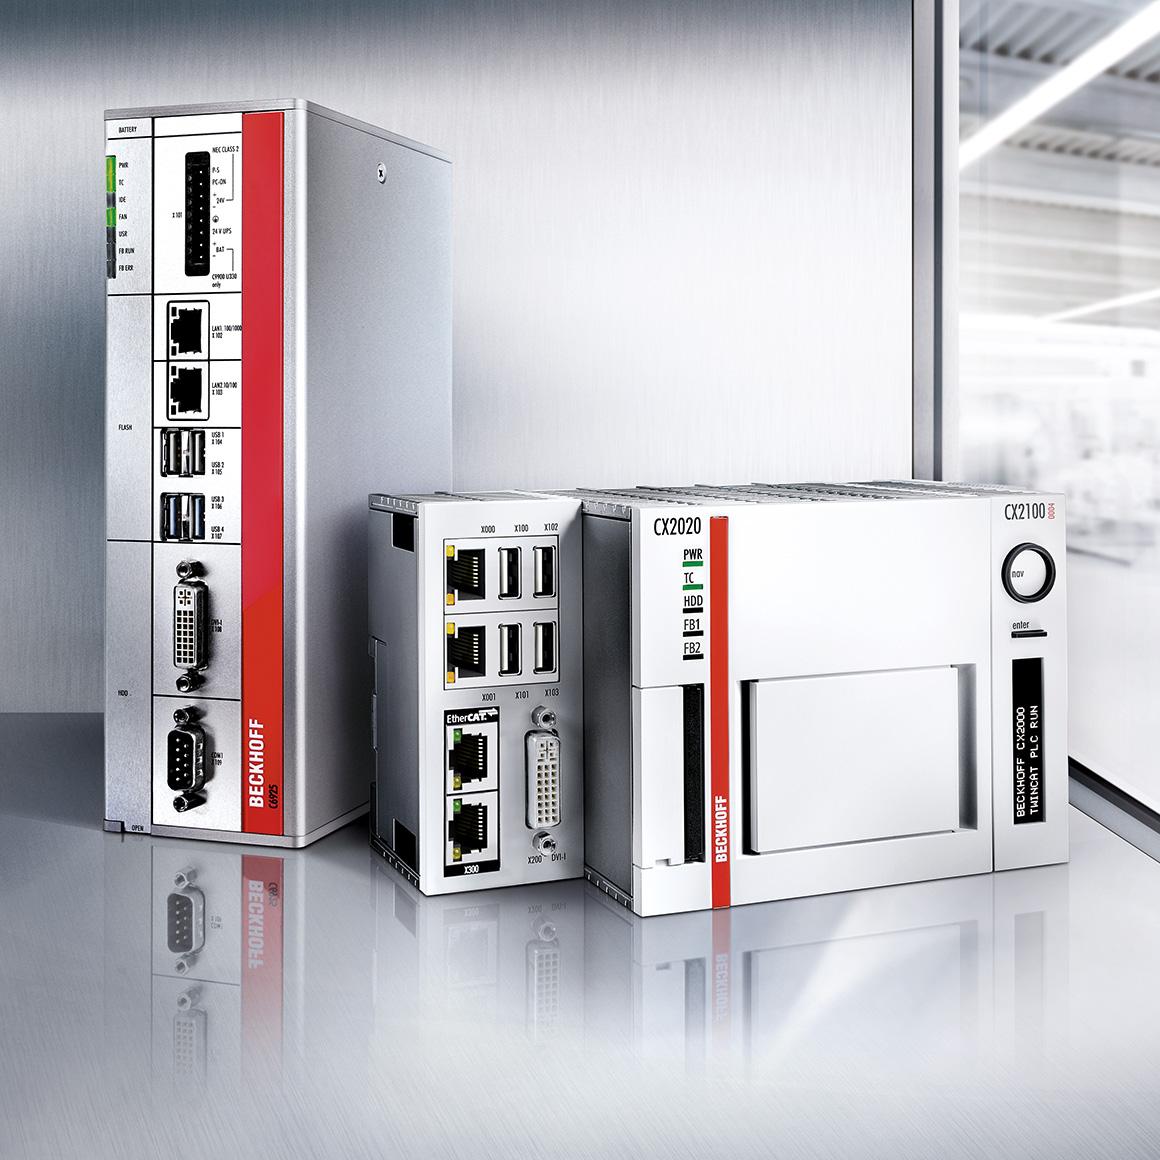 BECKHOFF Industrial PC IPCs